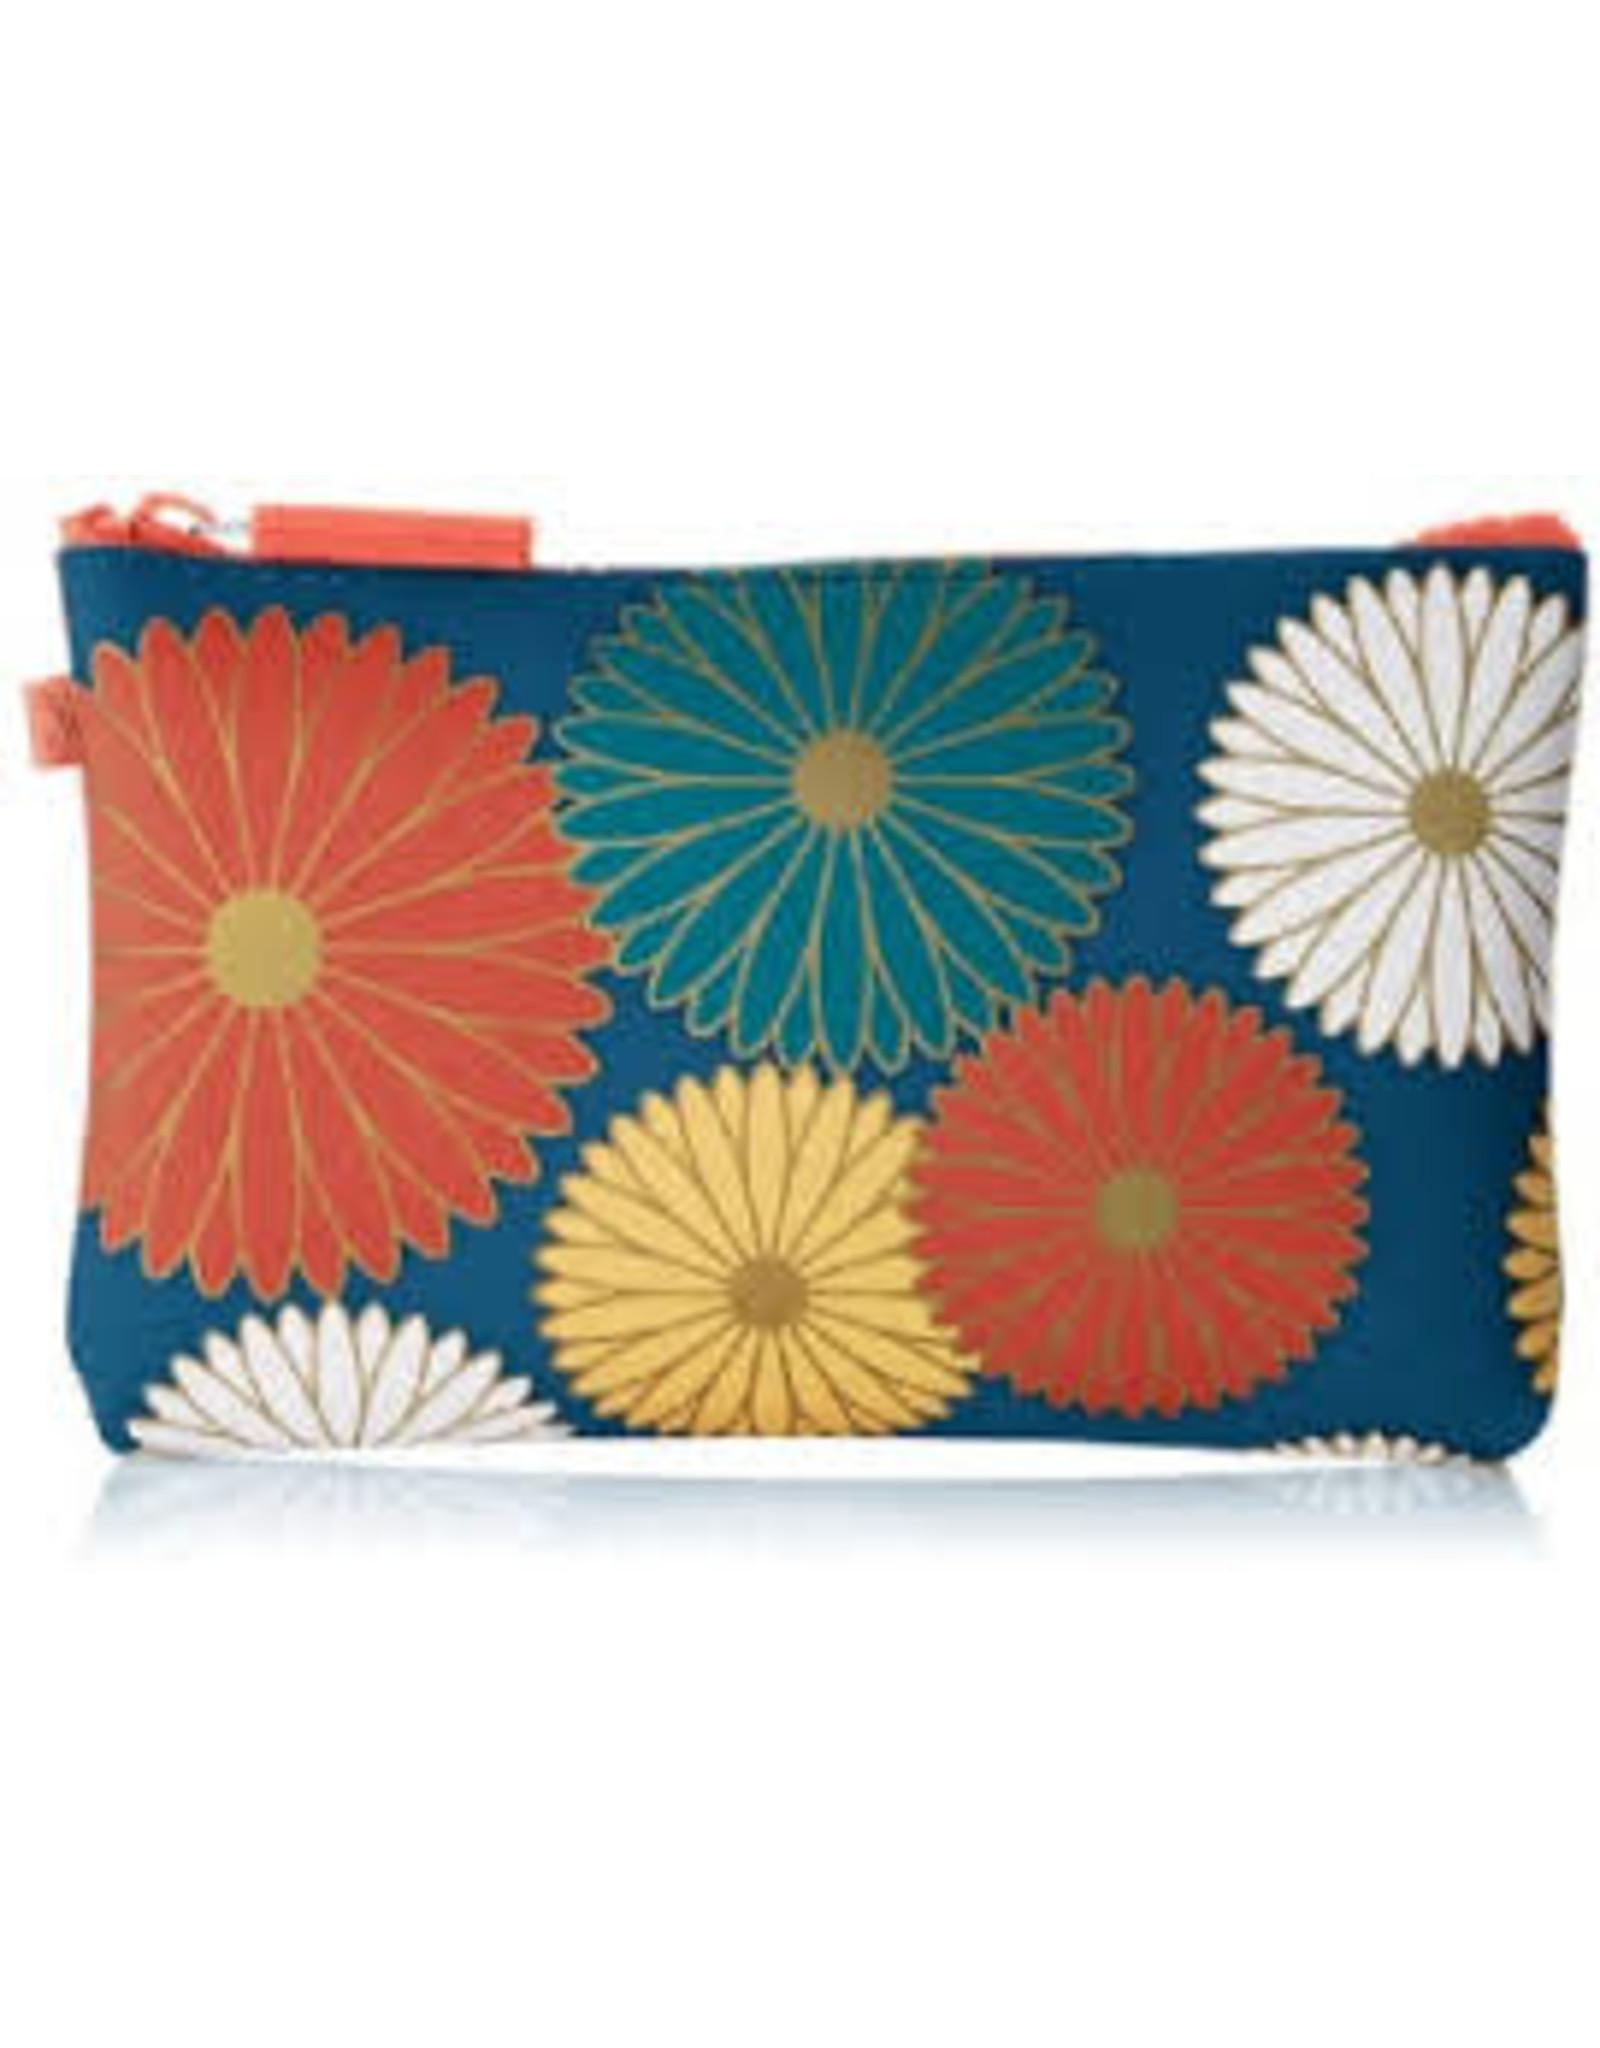 PG Design Inc. NUU JAPAN FLOWER BLUE